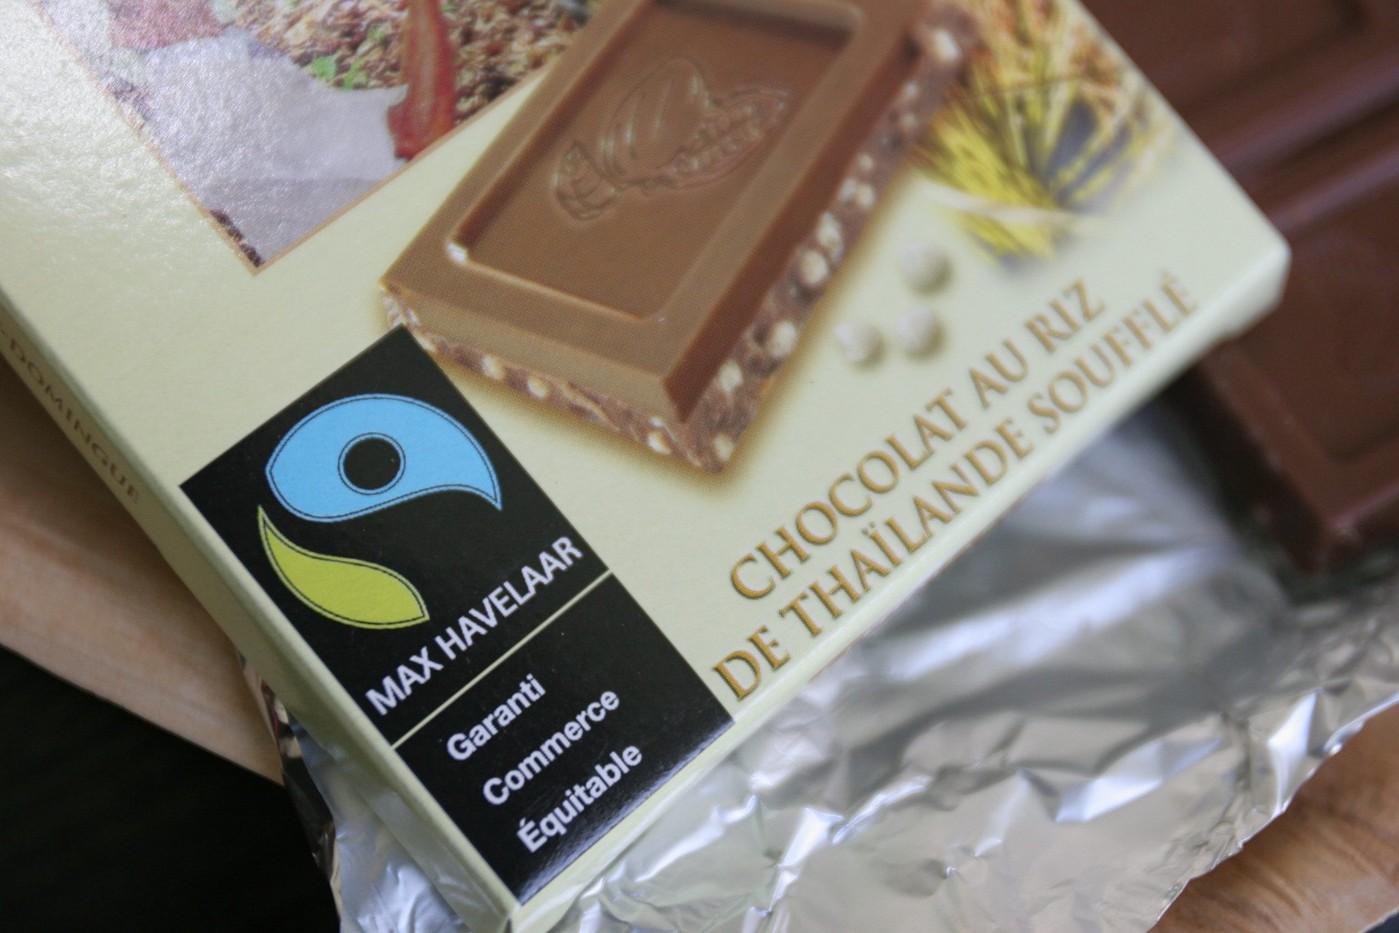 En-2017-1-menage-2-France-lachat-produits-Fairtrade-Max-Havelaar-SEBASTIEN LAPEYRERE/MAXPPP